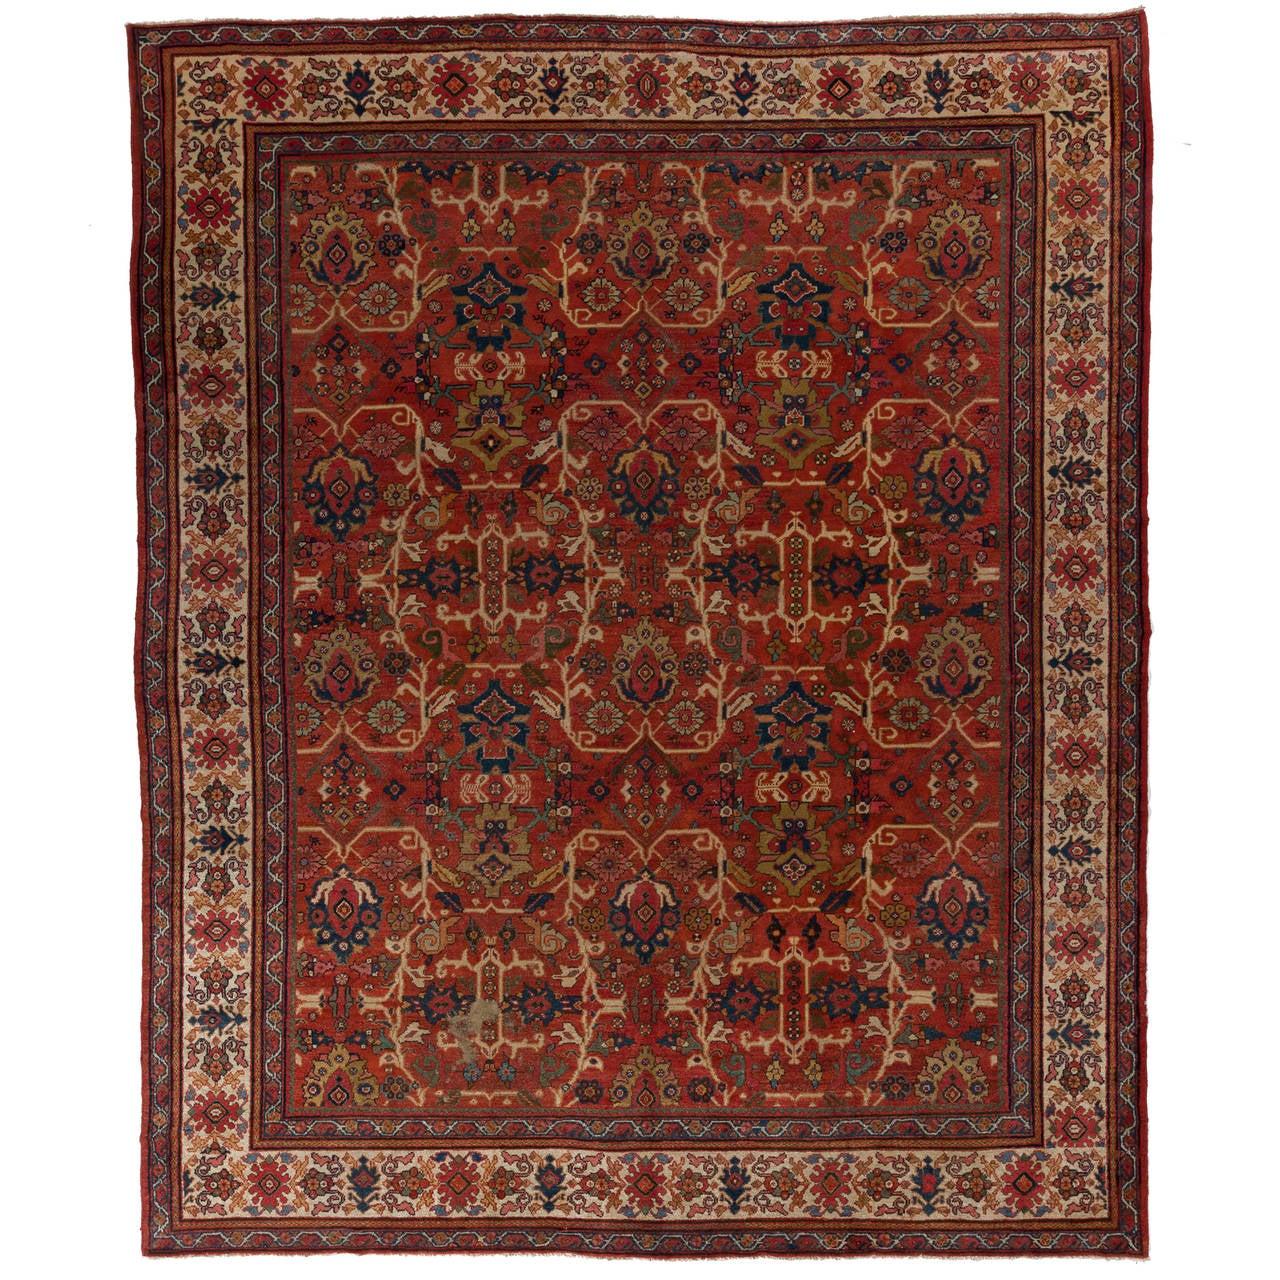 Impressive Antique Persian Mahal Rug For Sale At 1stdibs